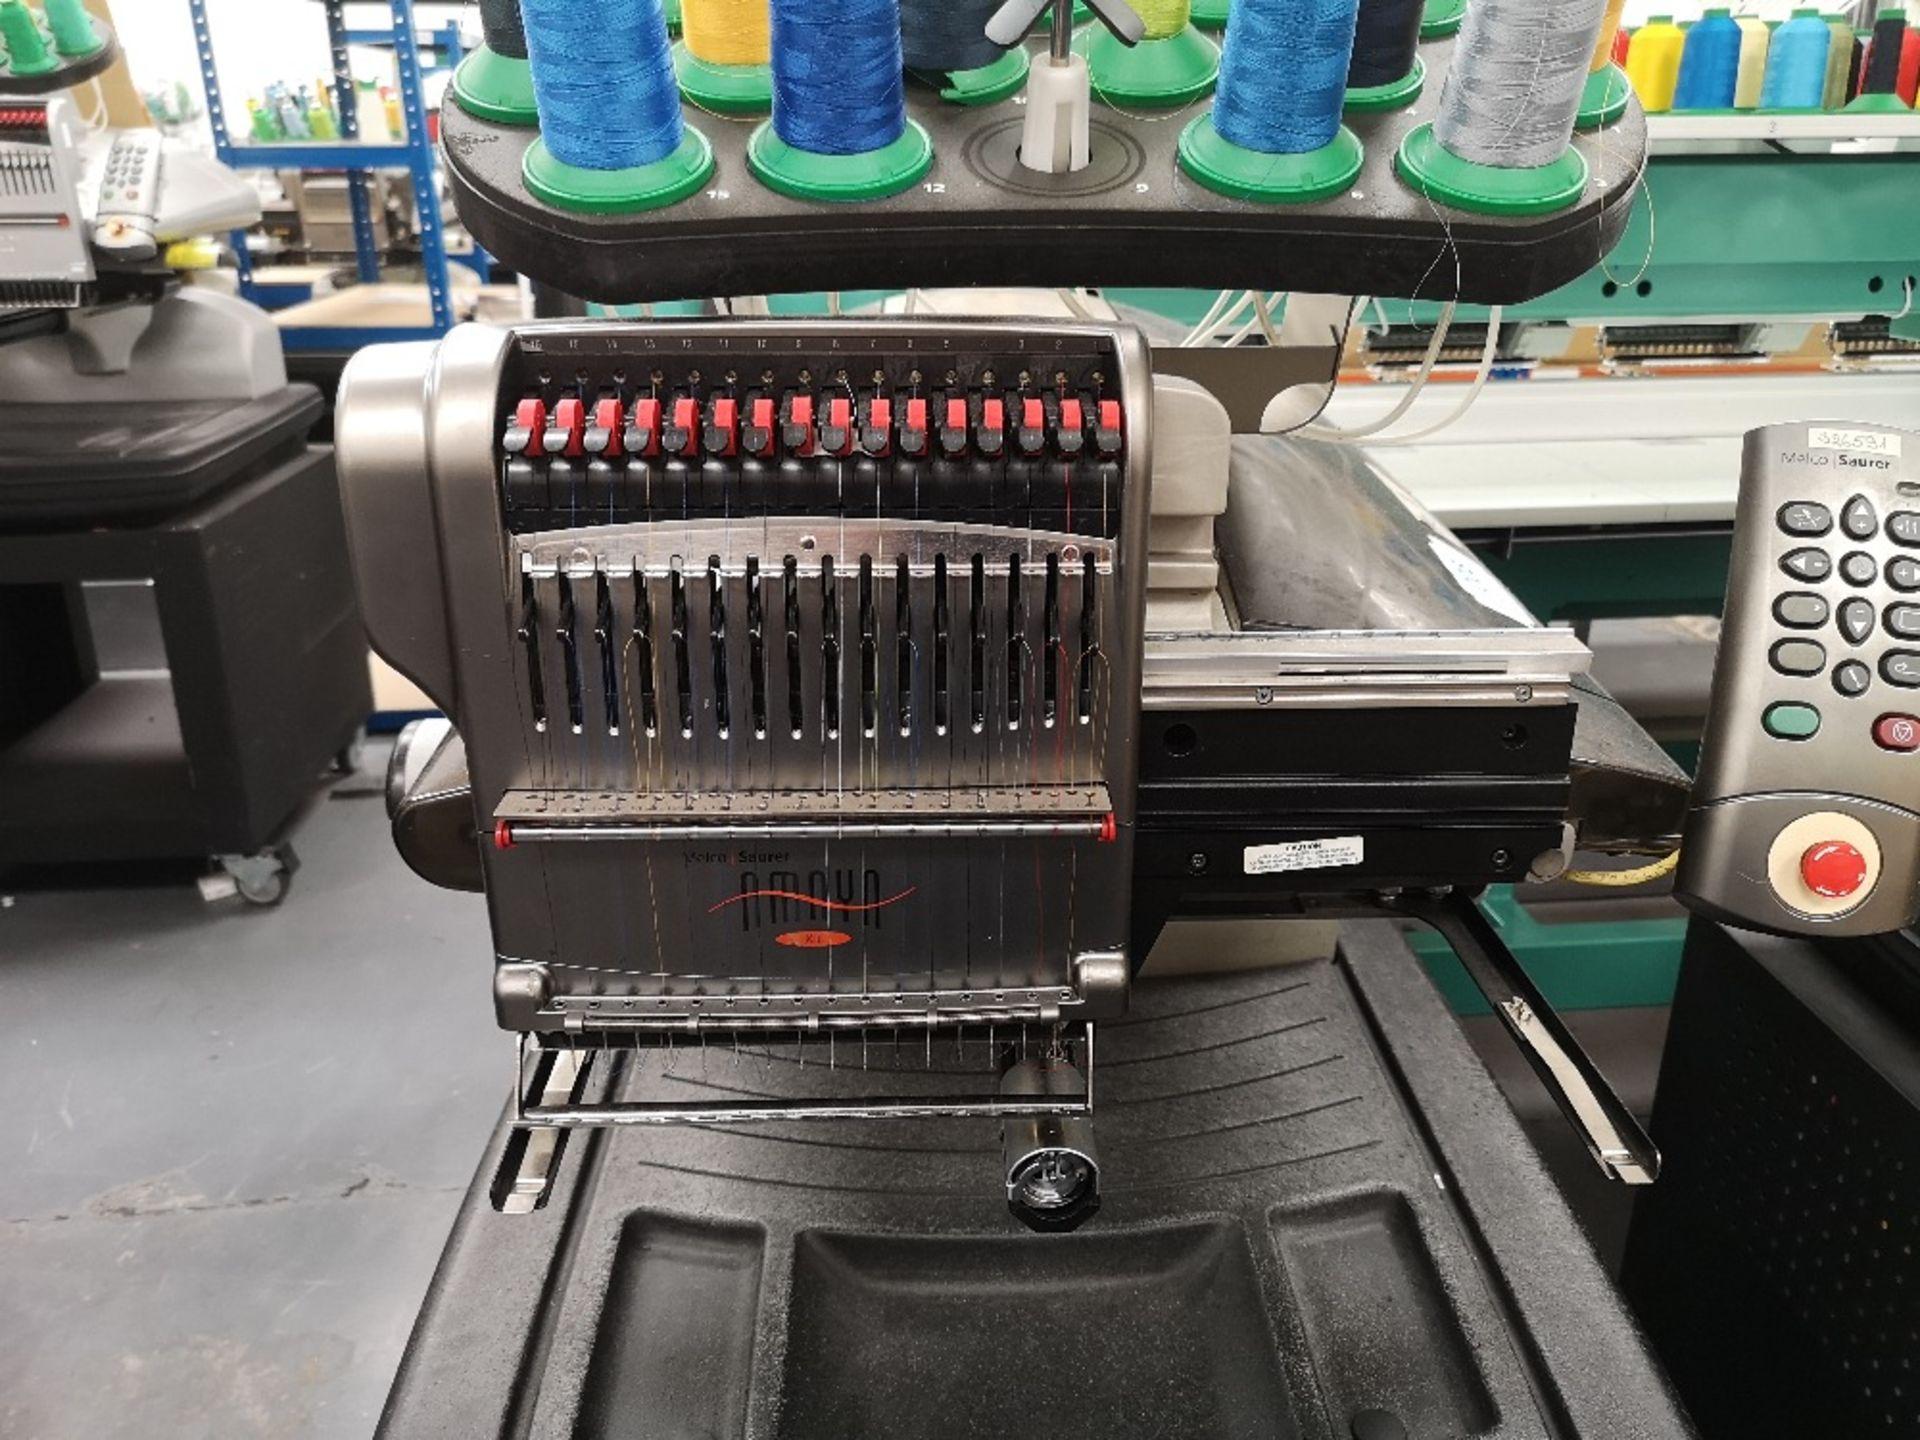 MELCO Amaya Embroidery Machine XT PN 3000007 - Image 3 of 4